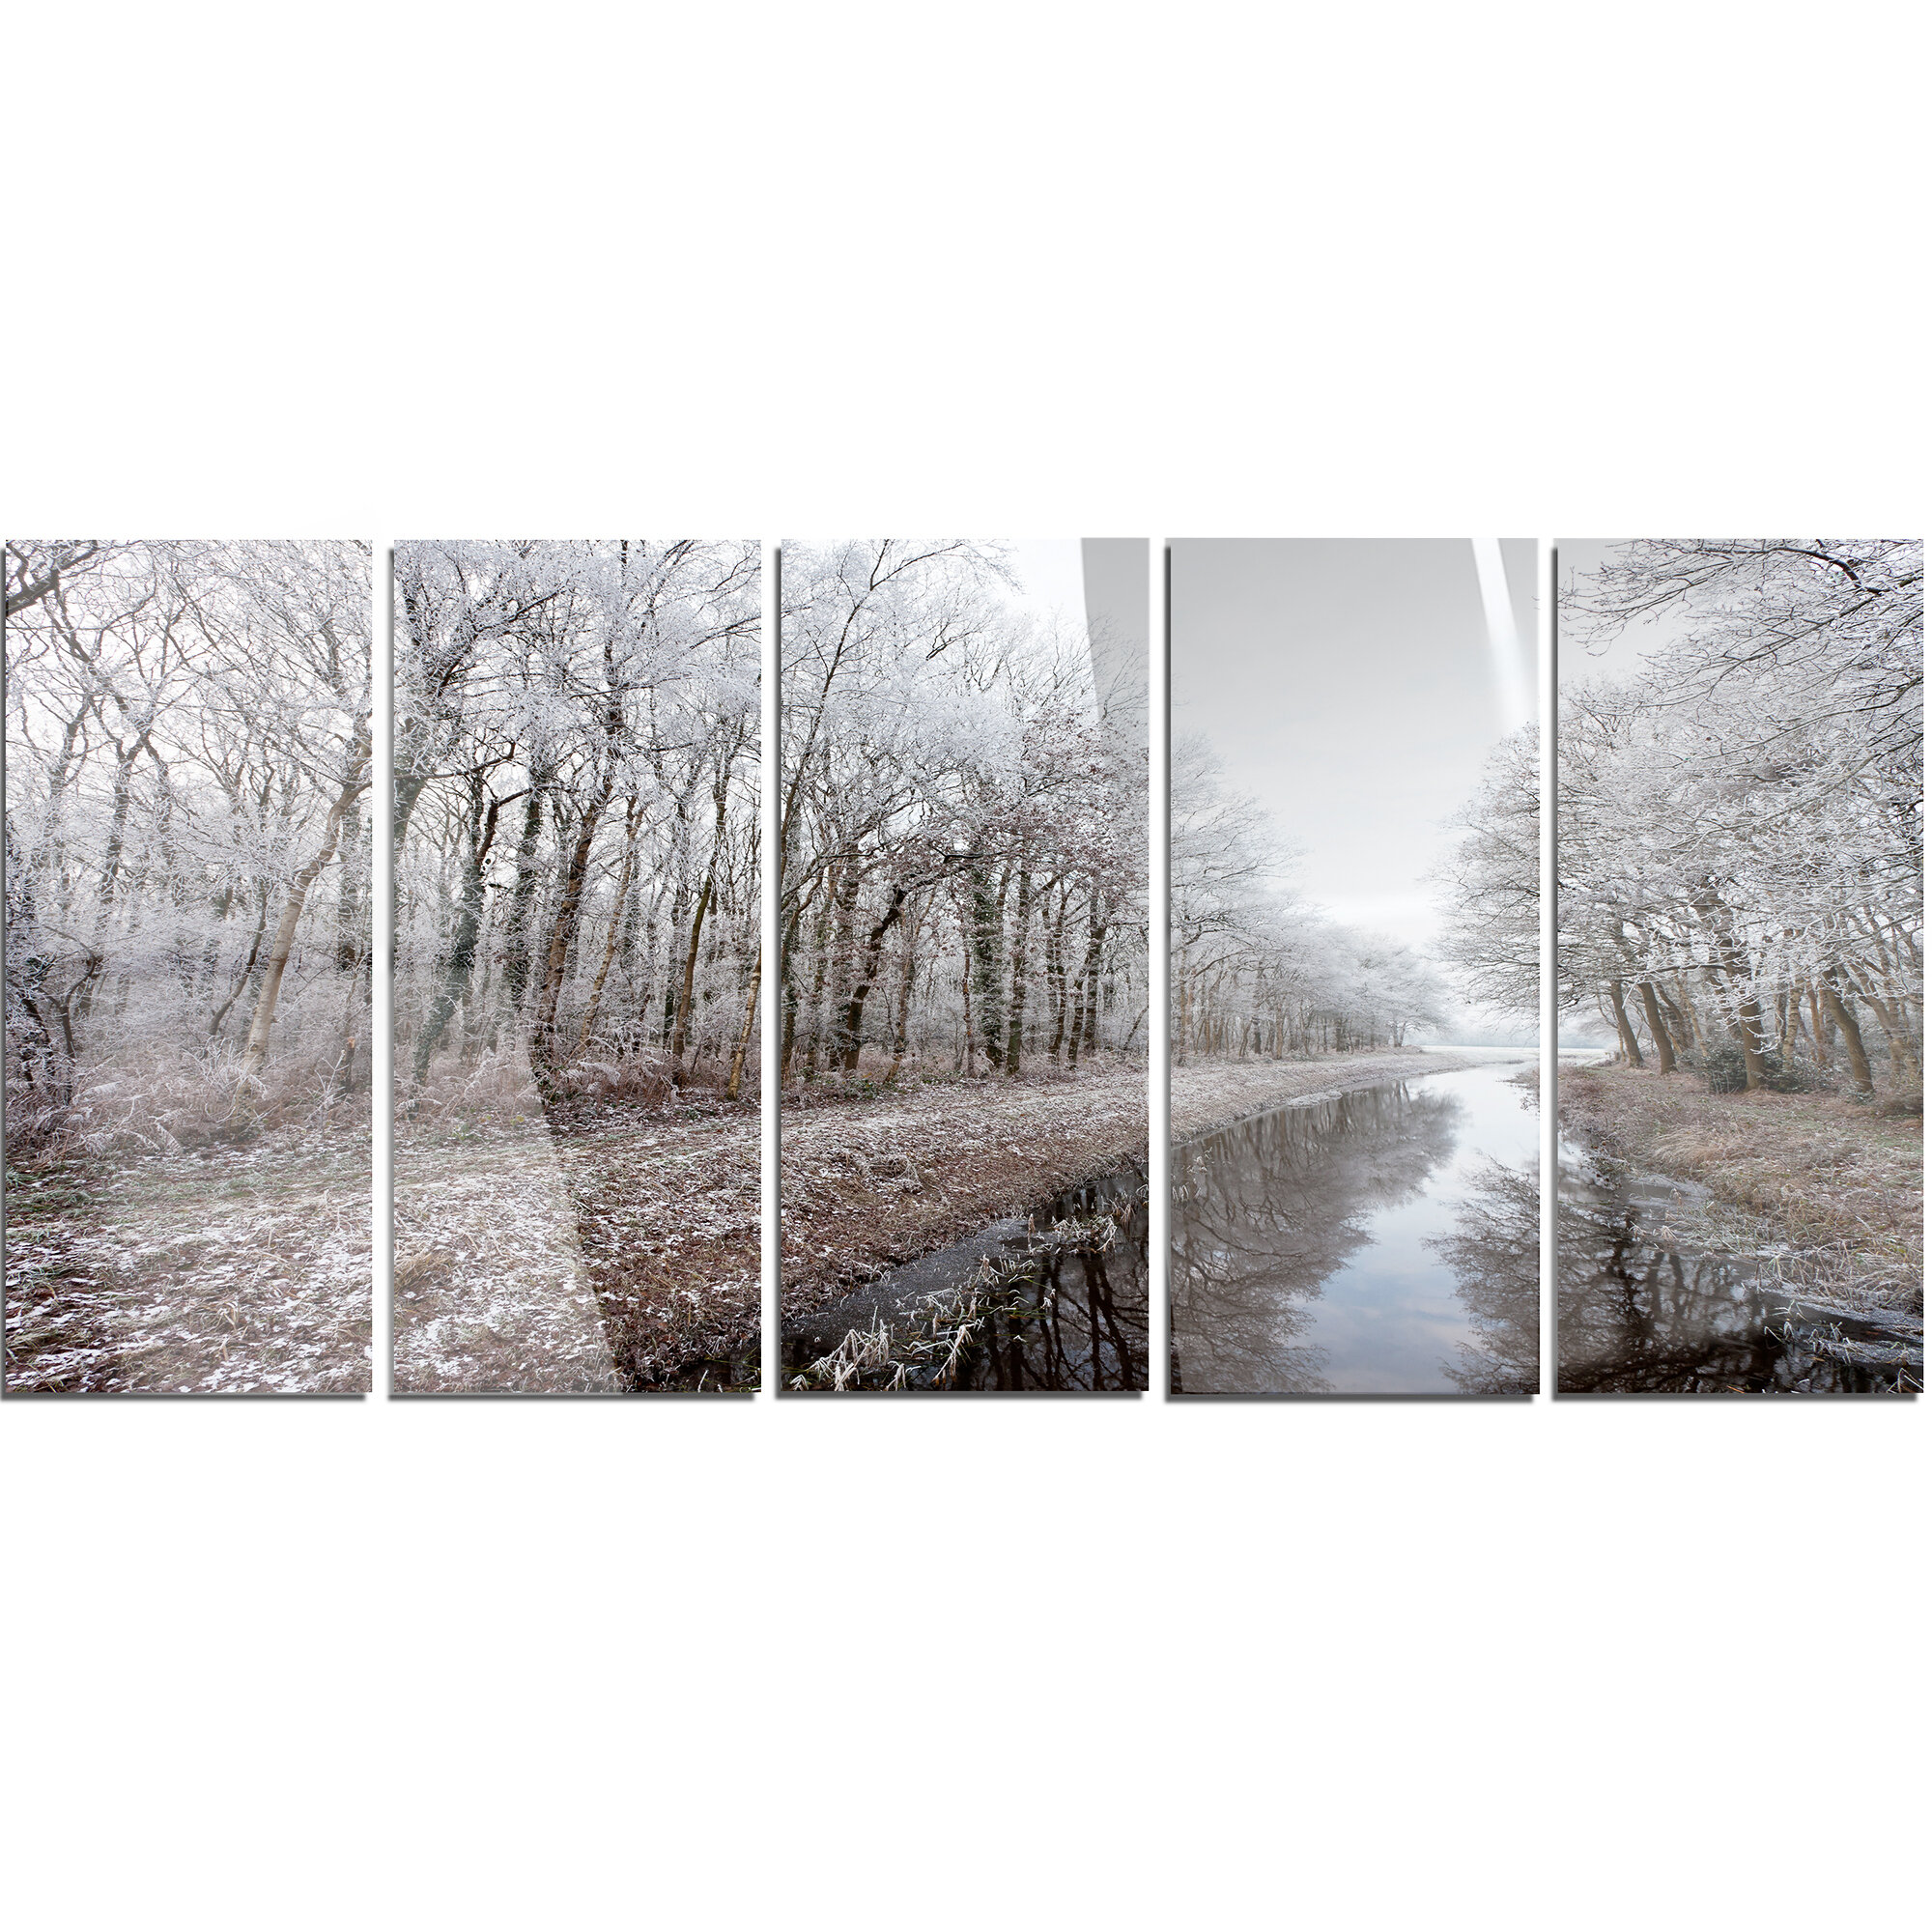 Designart Trees In White Winter Landscape 5 Piece Photographic Print On Metal Set Wayfair